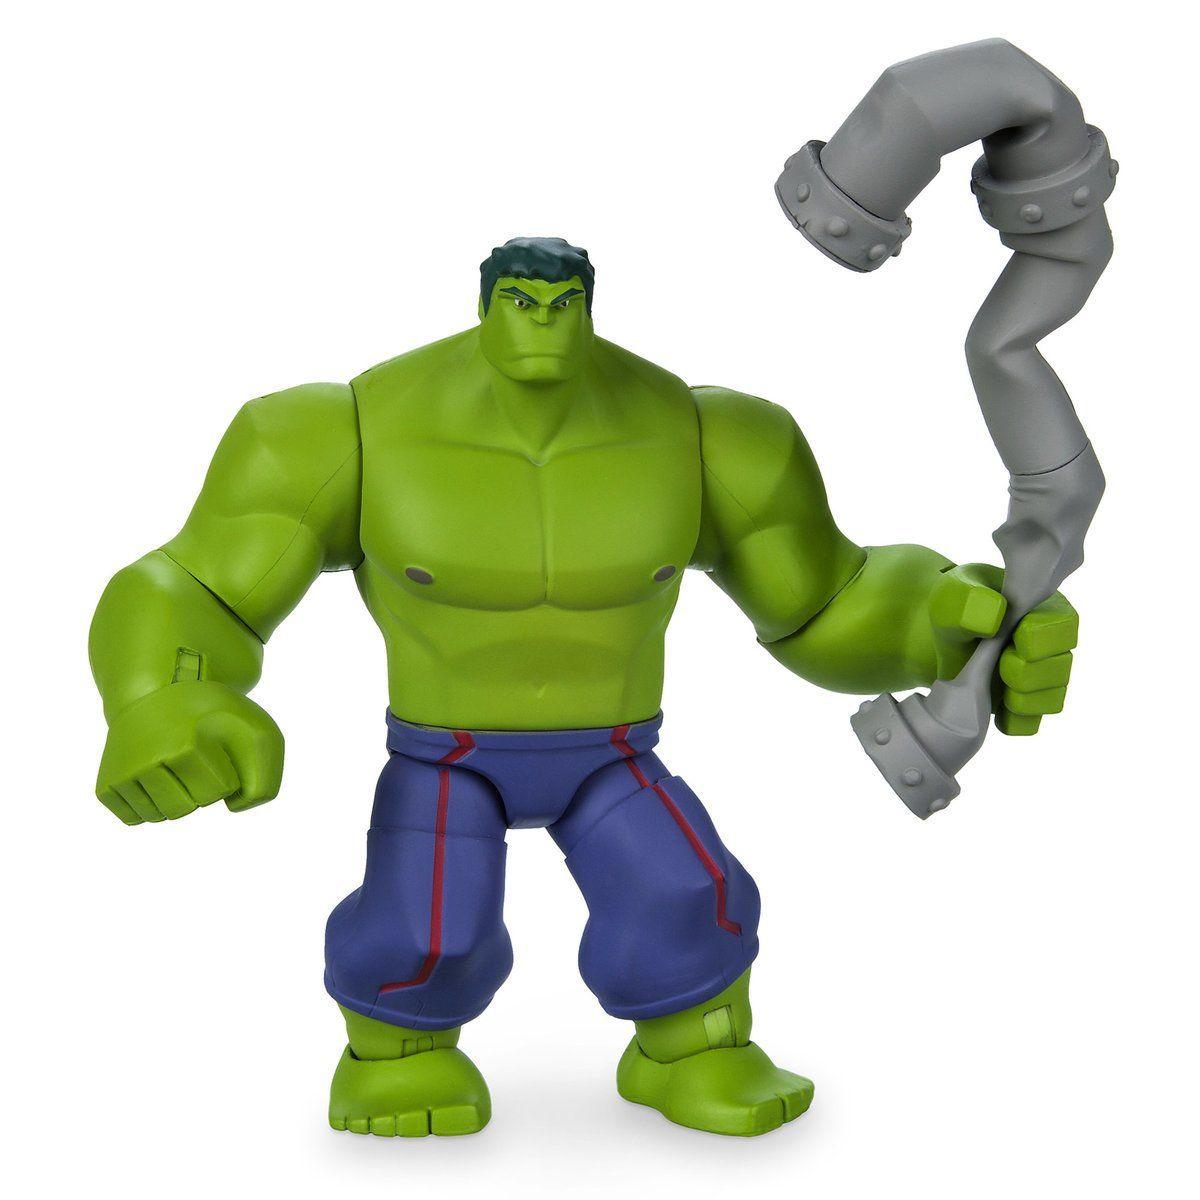 Boneco Hulk: Marvel ToyBox - Disney